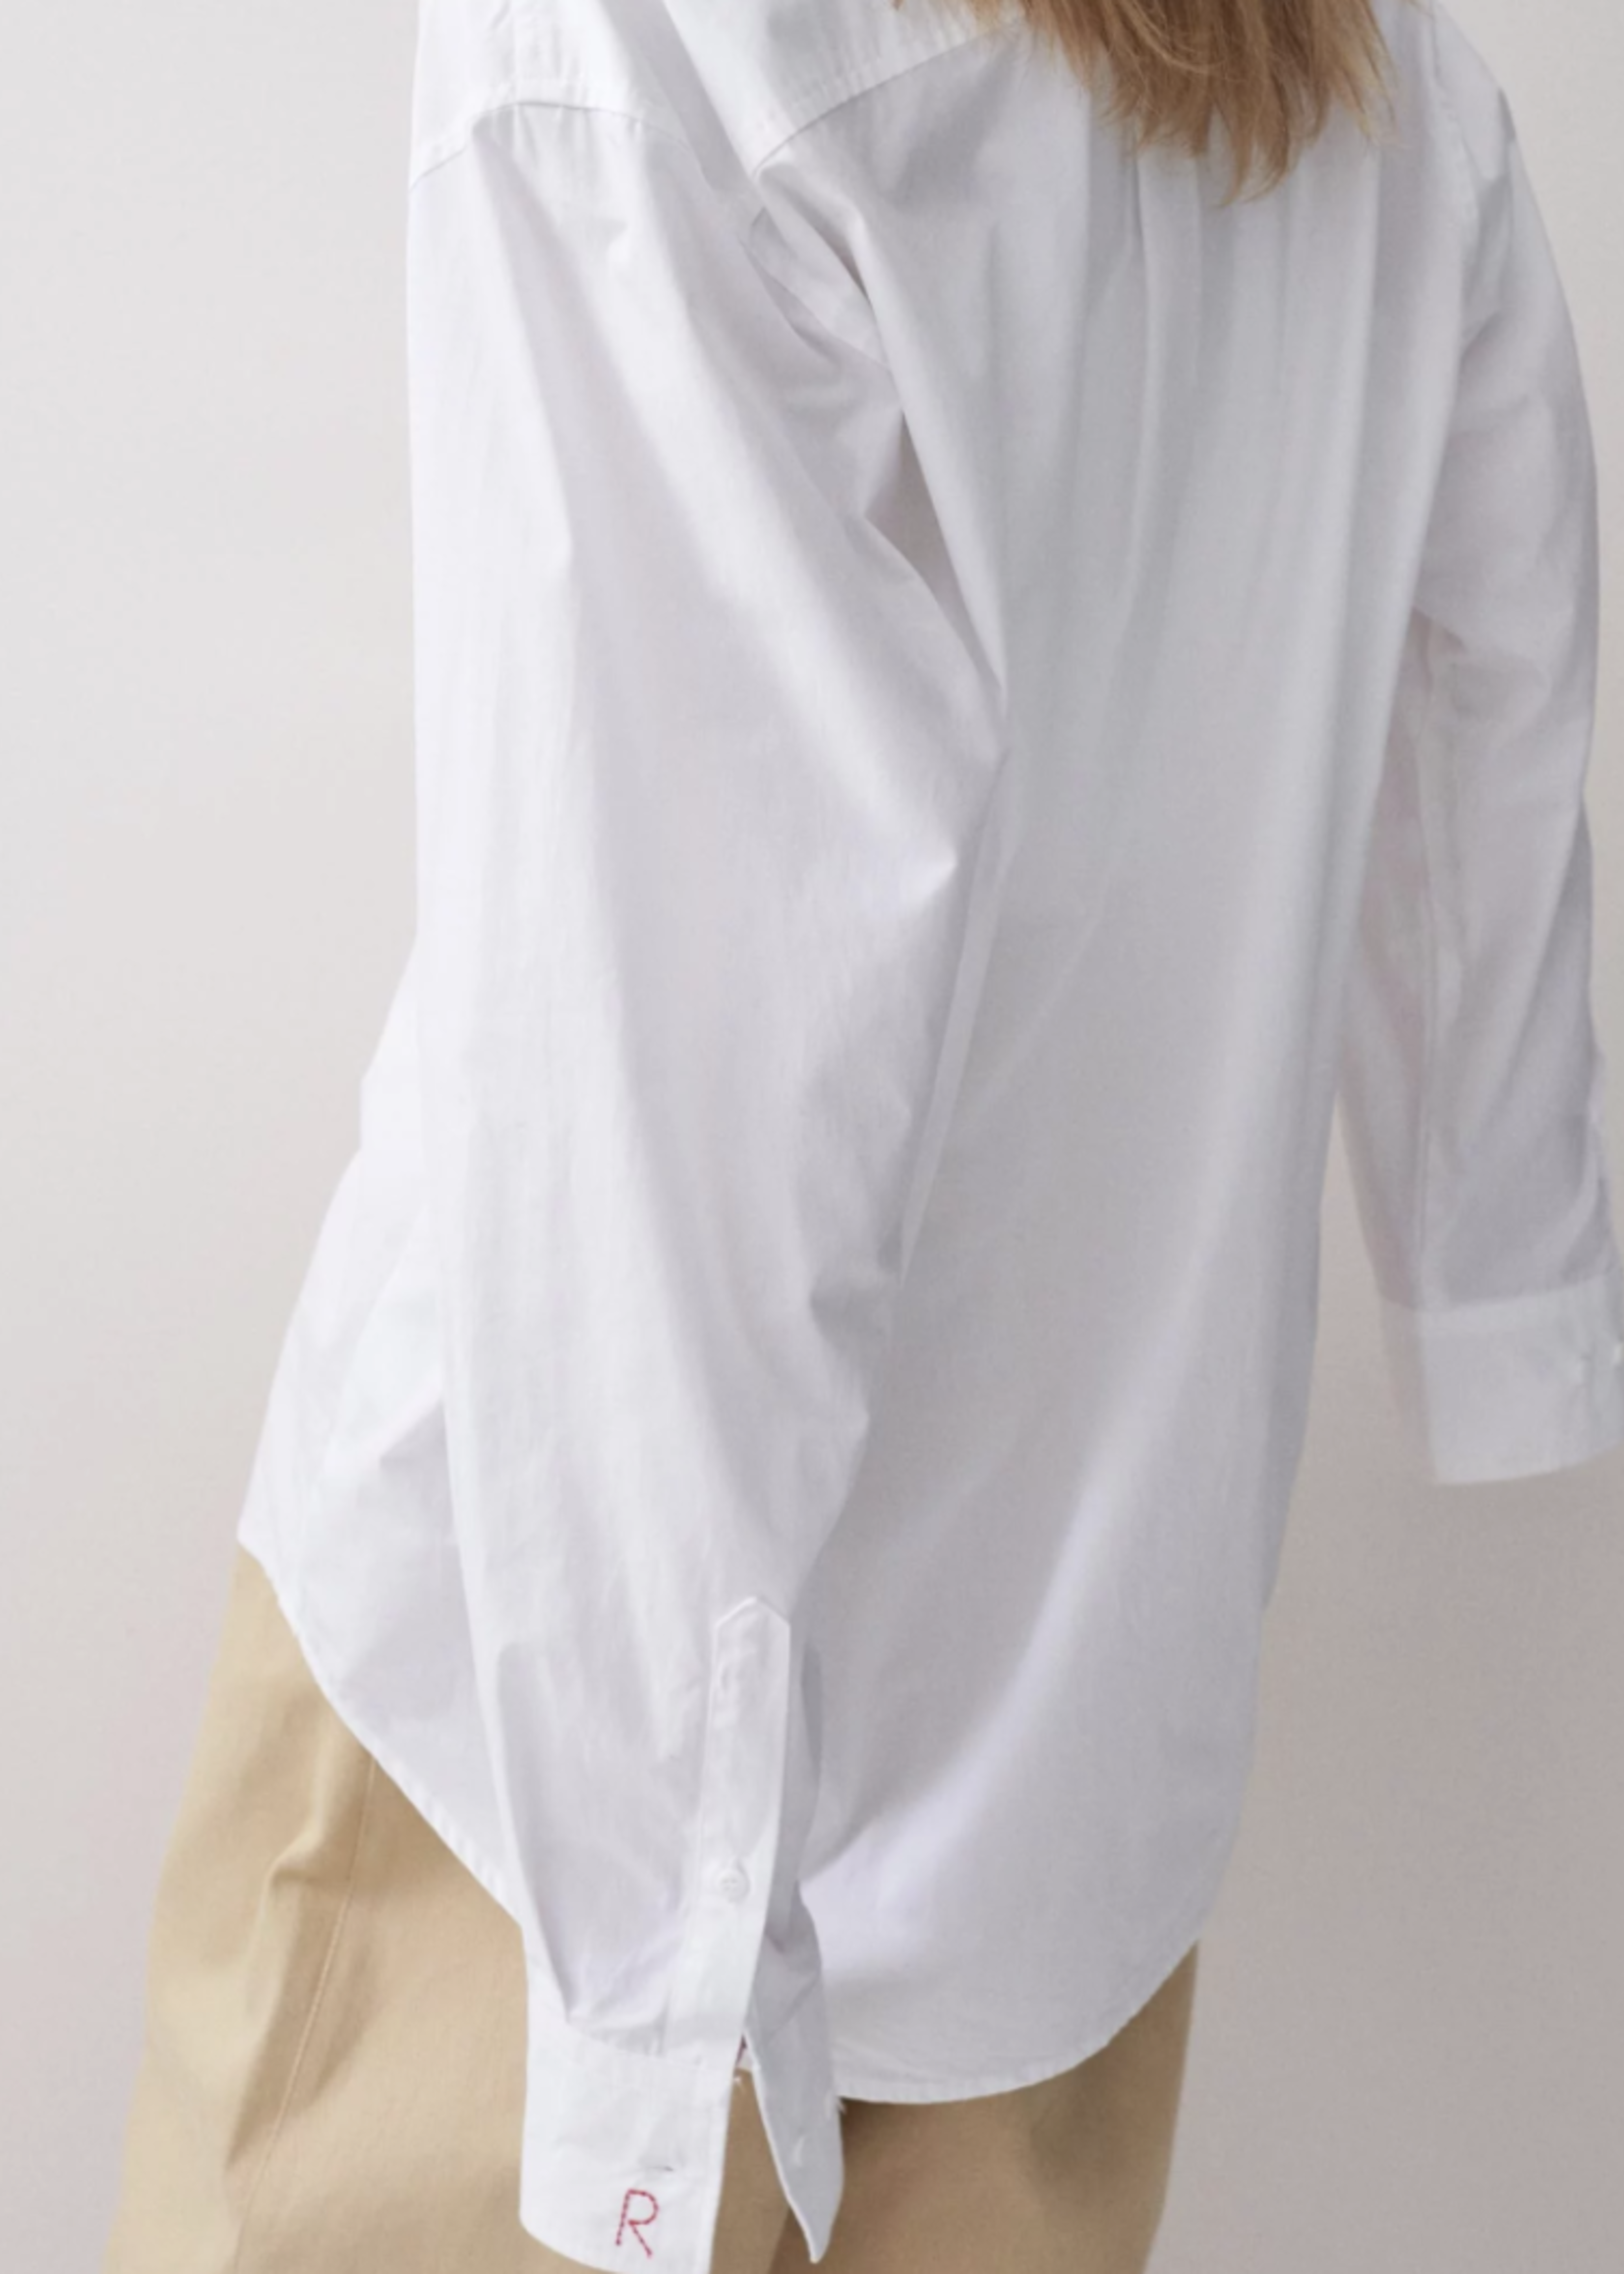 rikastudios rikastudios blaze shirt white